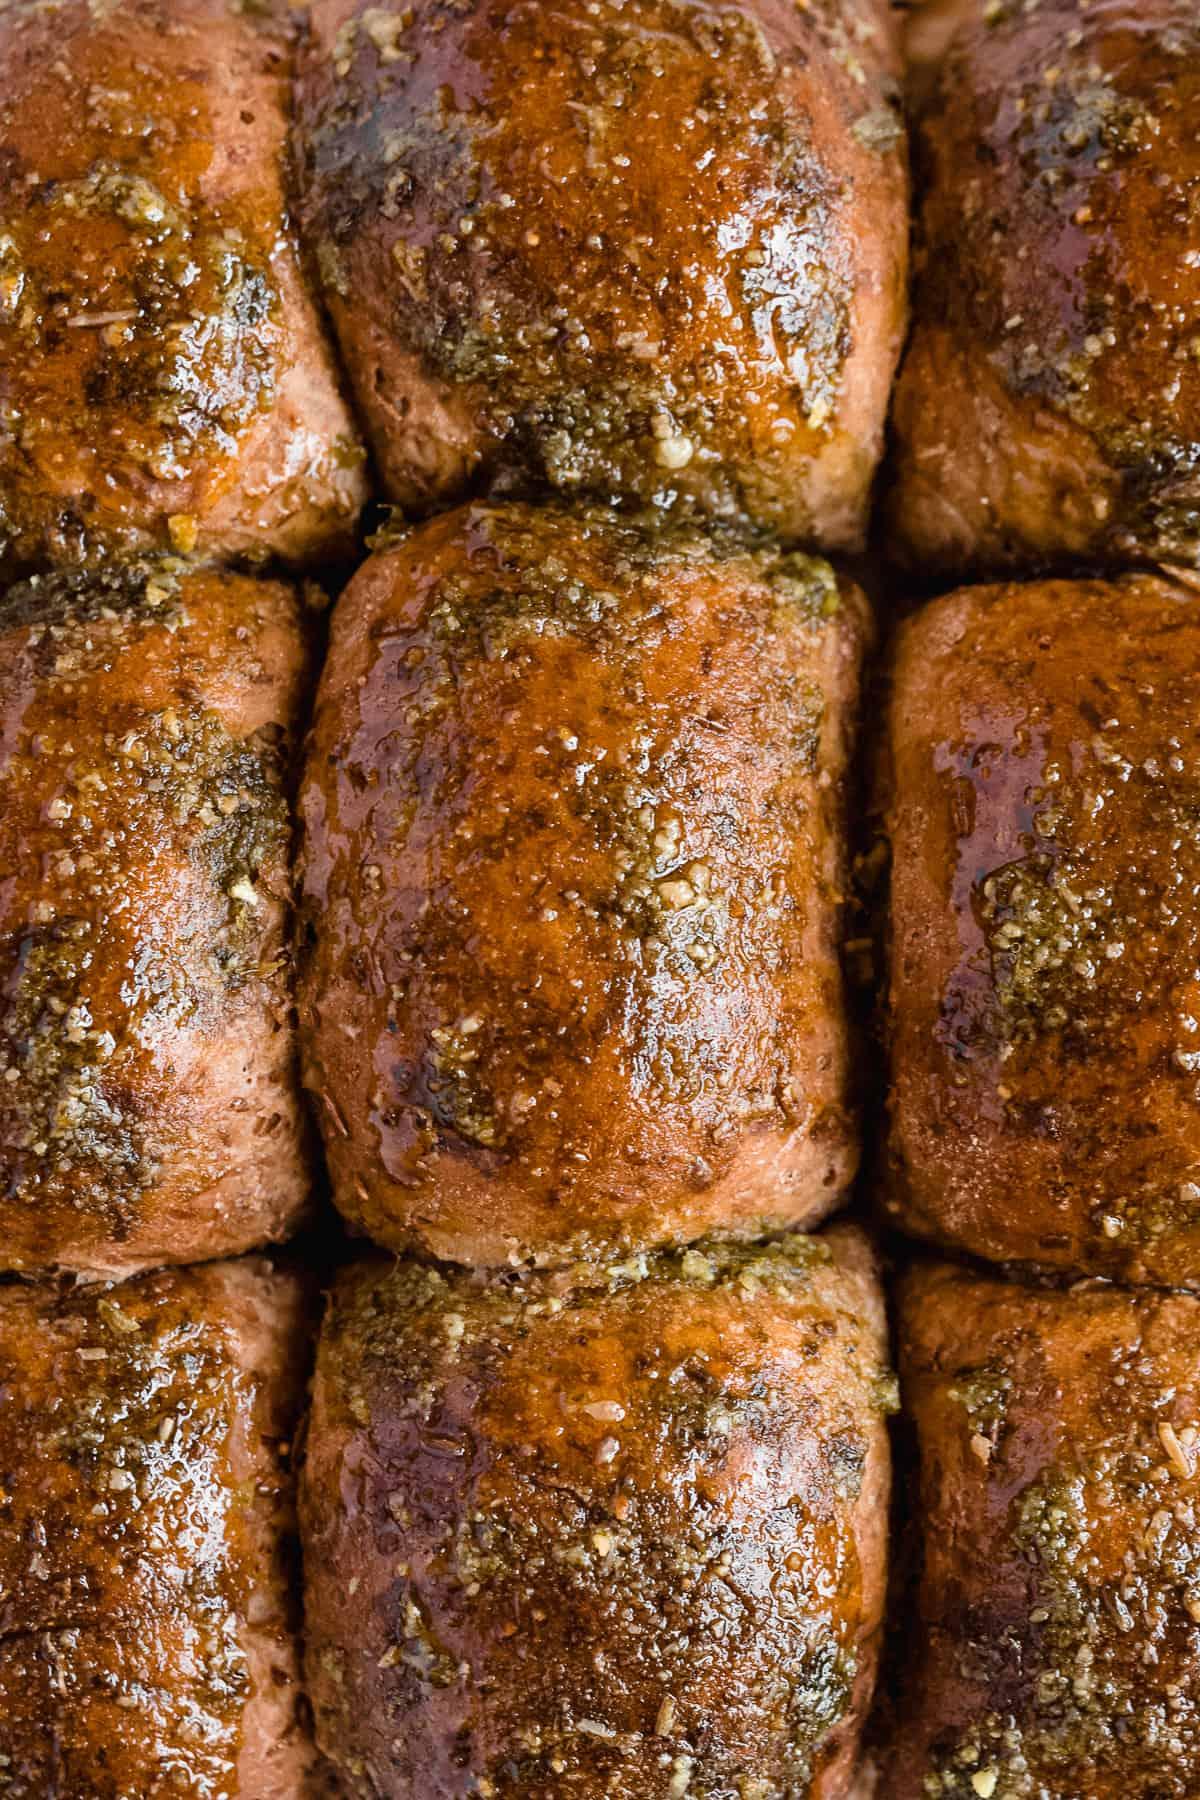 Overhead image of freshly baked Pesto Chicken Sliders.